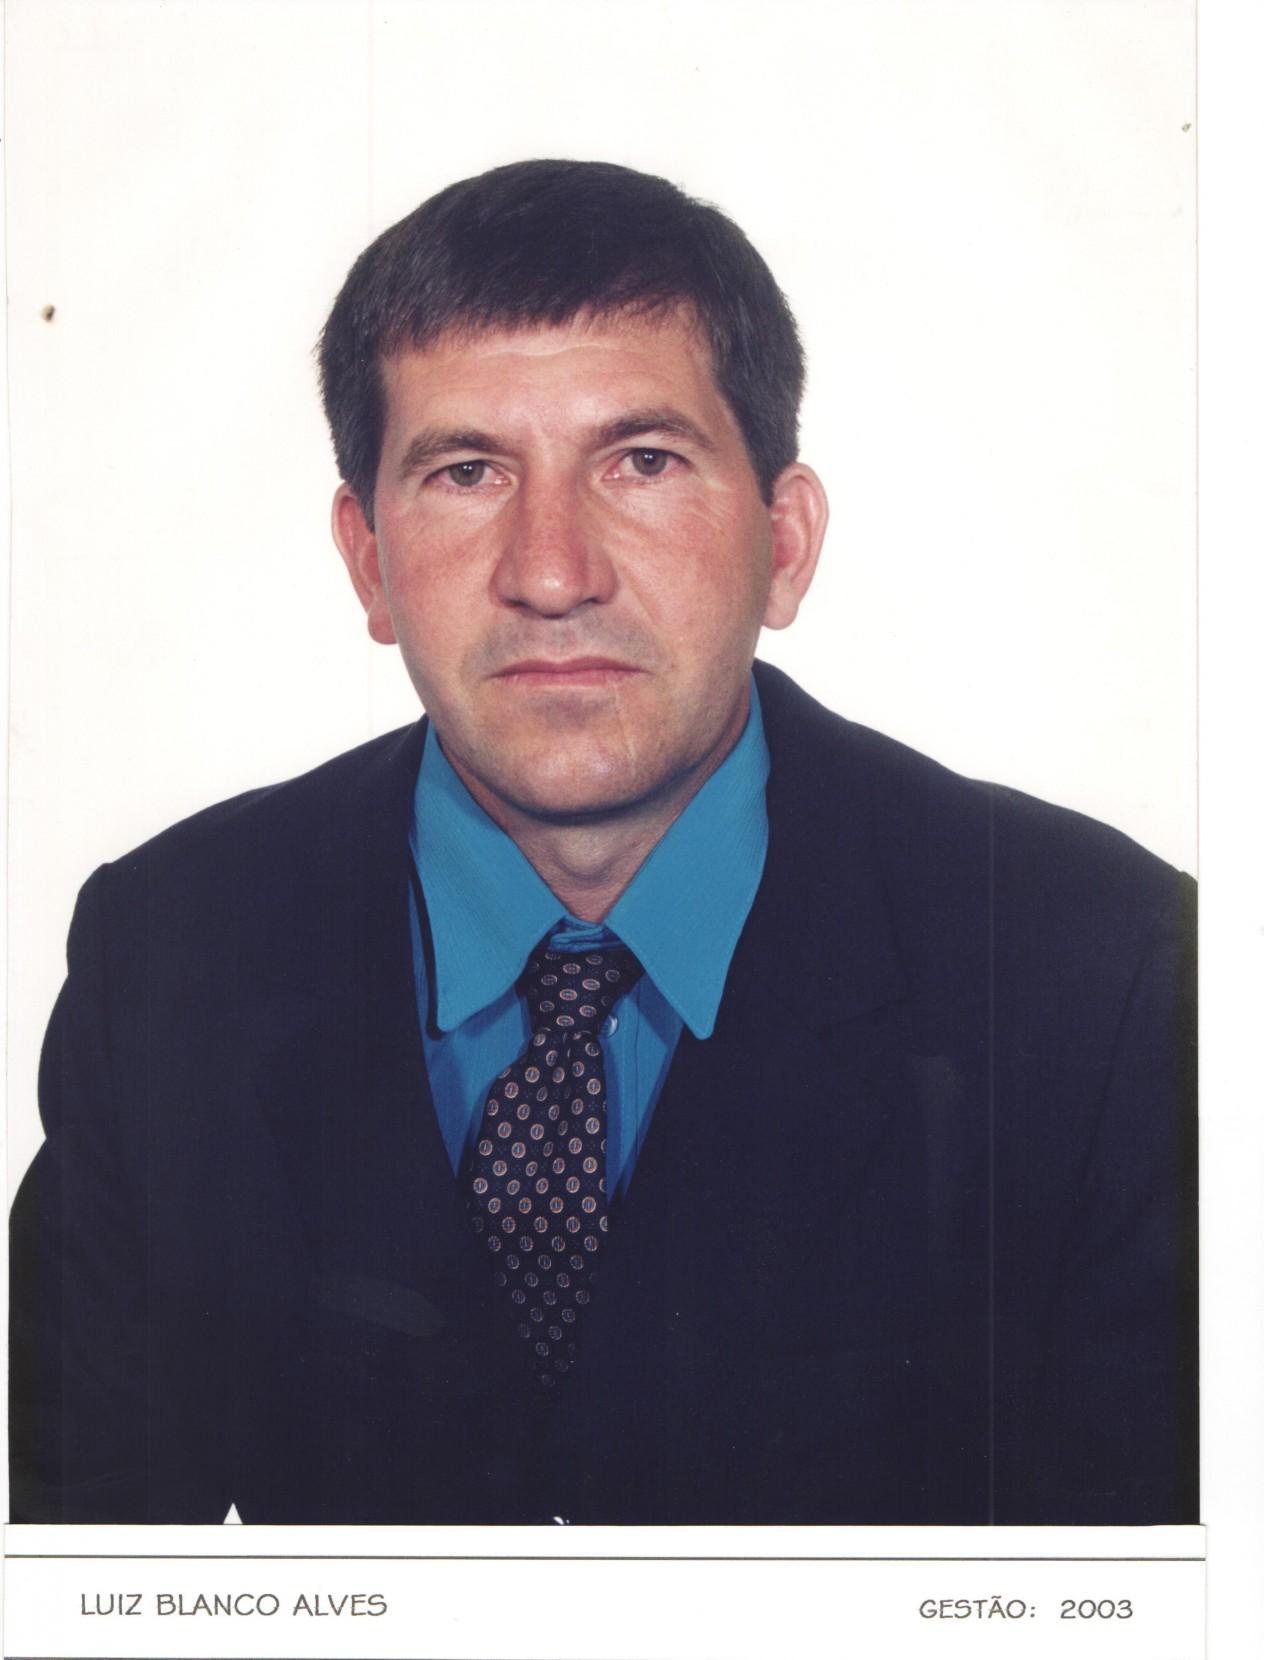 LUIZ BLANCO ALVES